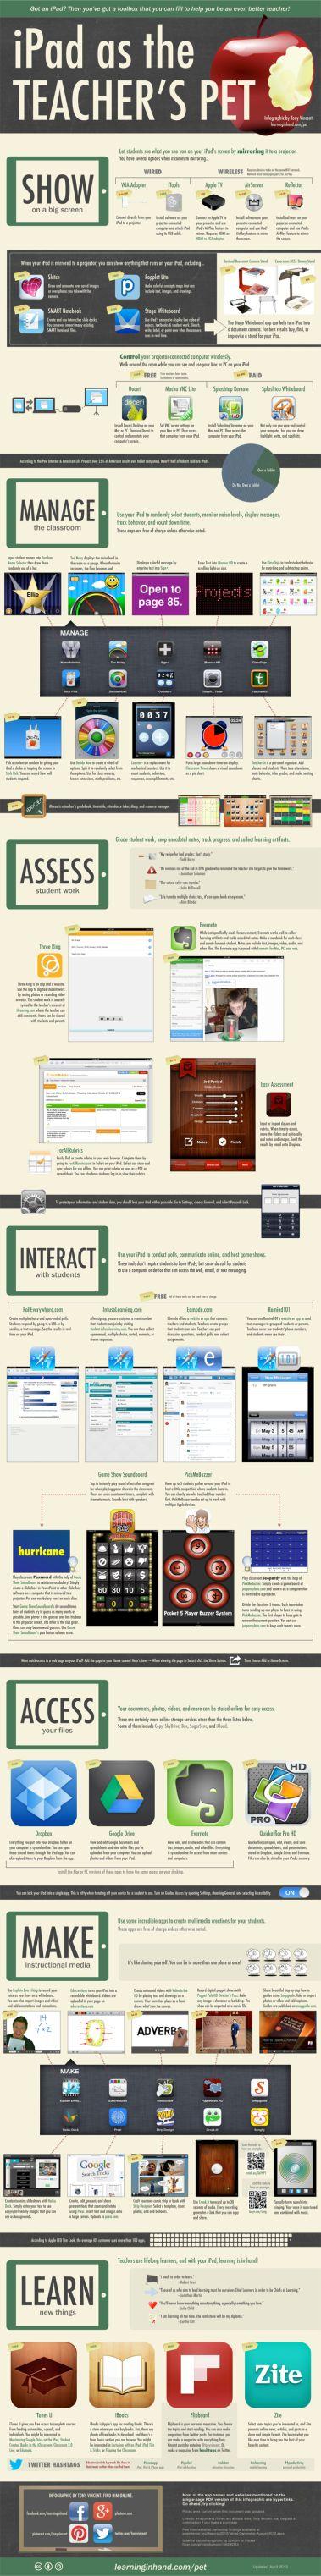 ways your ipad social studies classroom